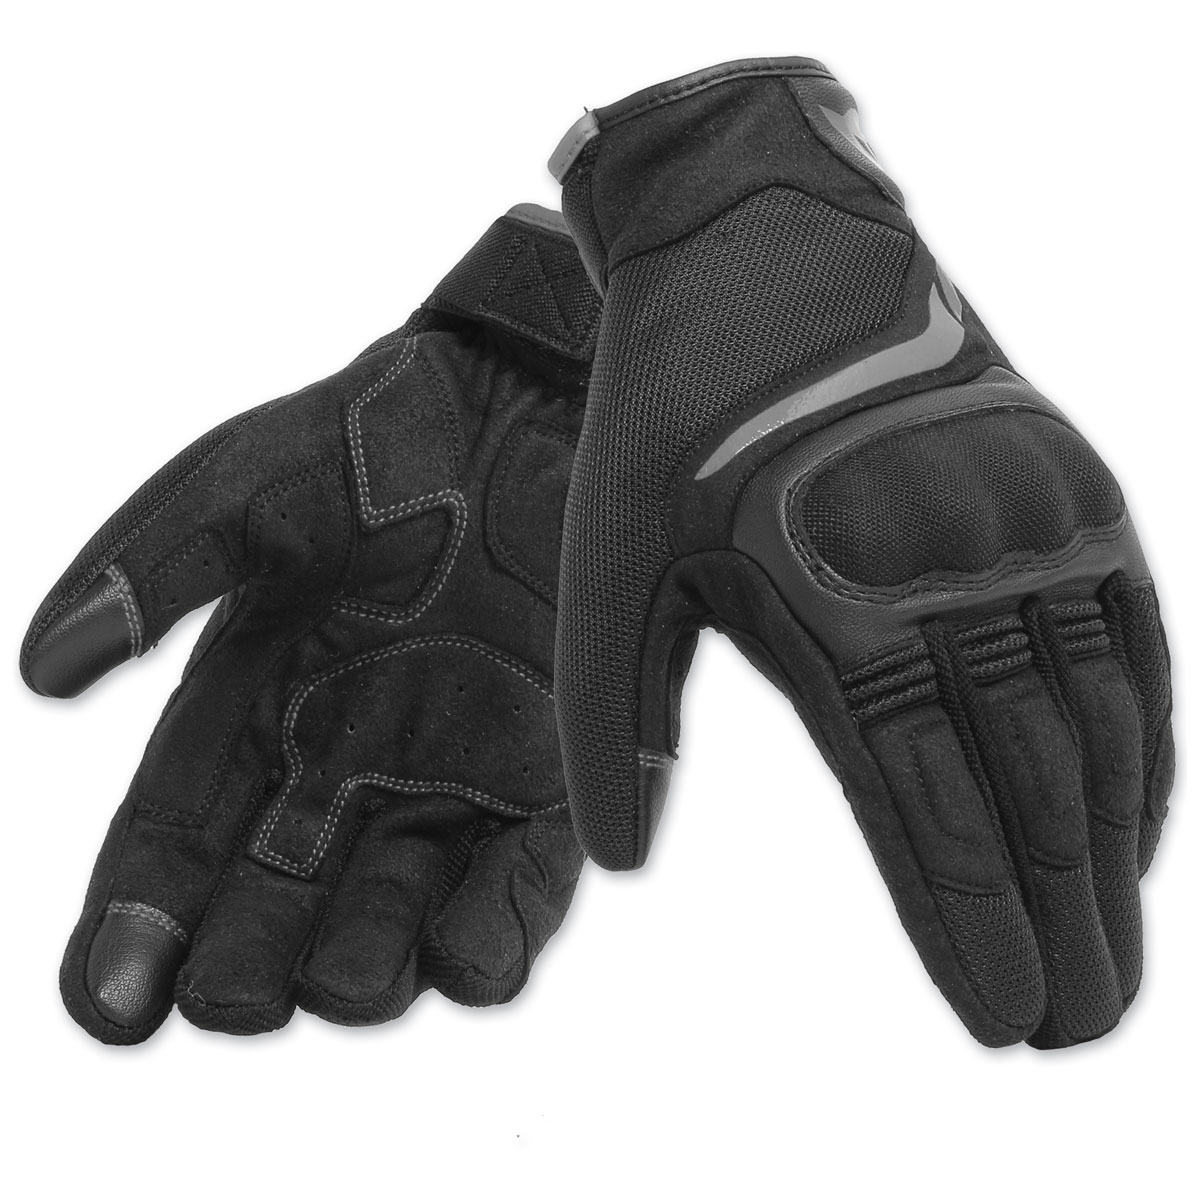 Dainese Unisex Air Master Black Gloves